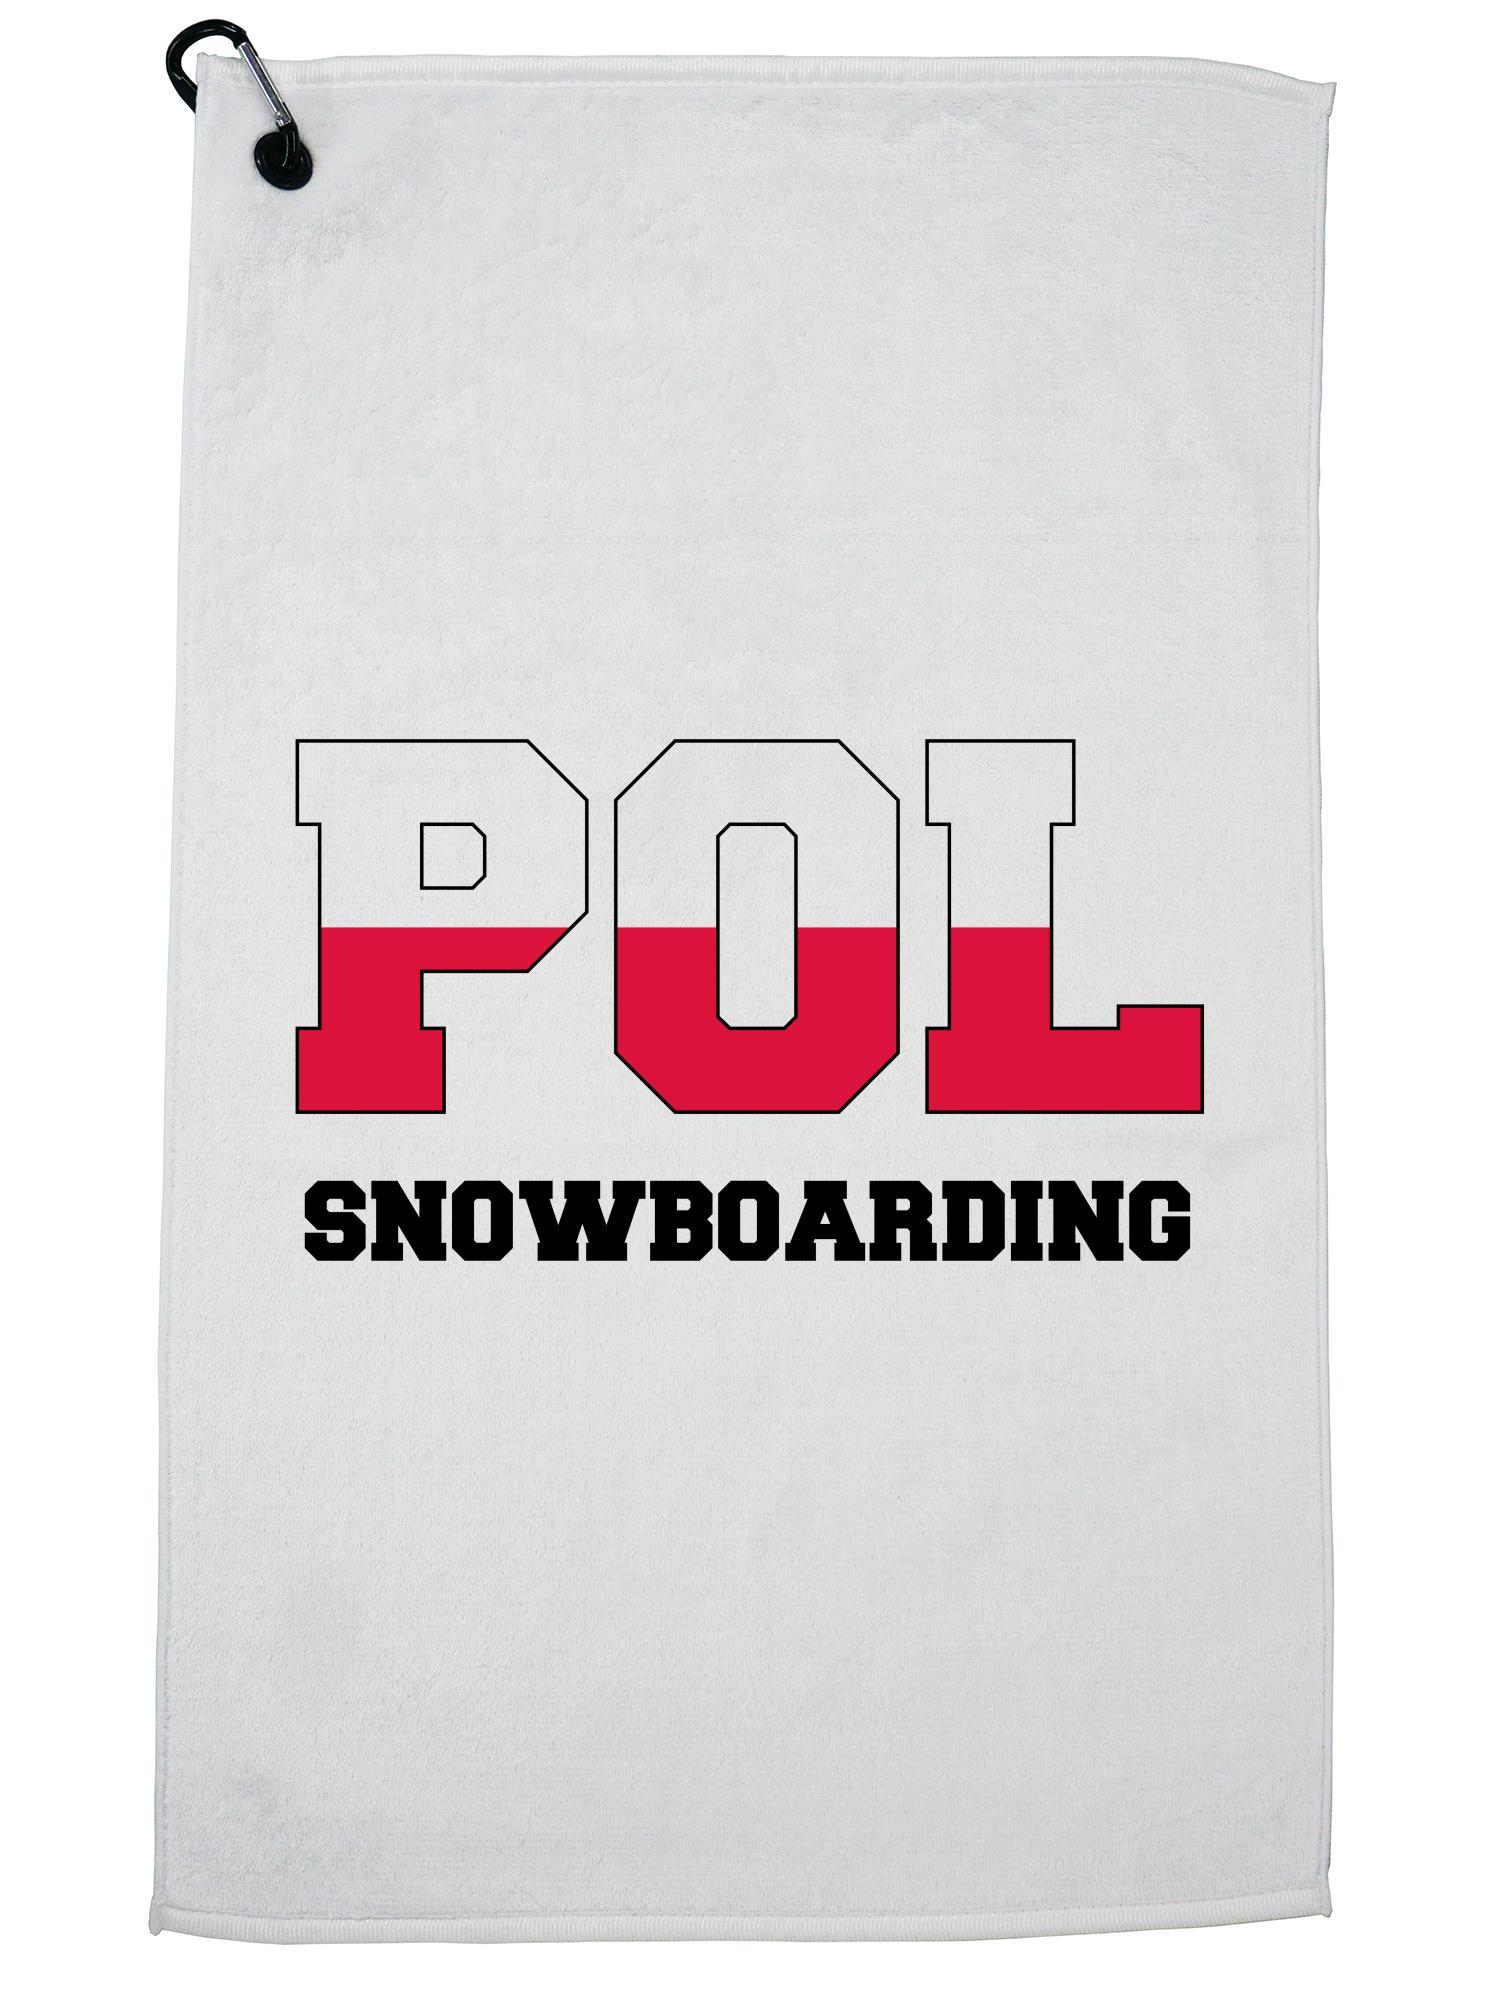 Polish Snowboarding Winter Olympic POL Flag Golf Towel with Carabiner Clip by Hollywood Thread